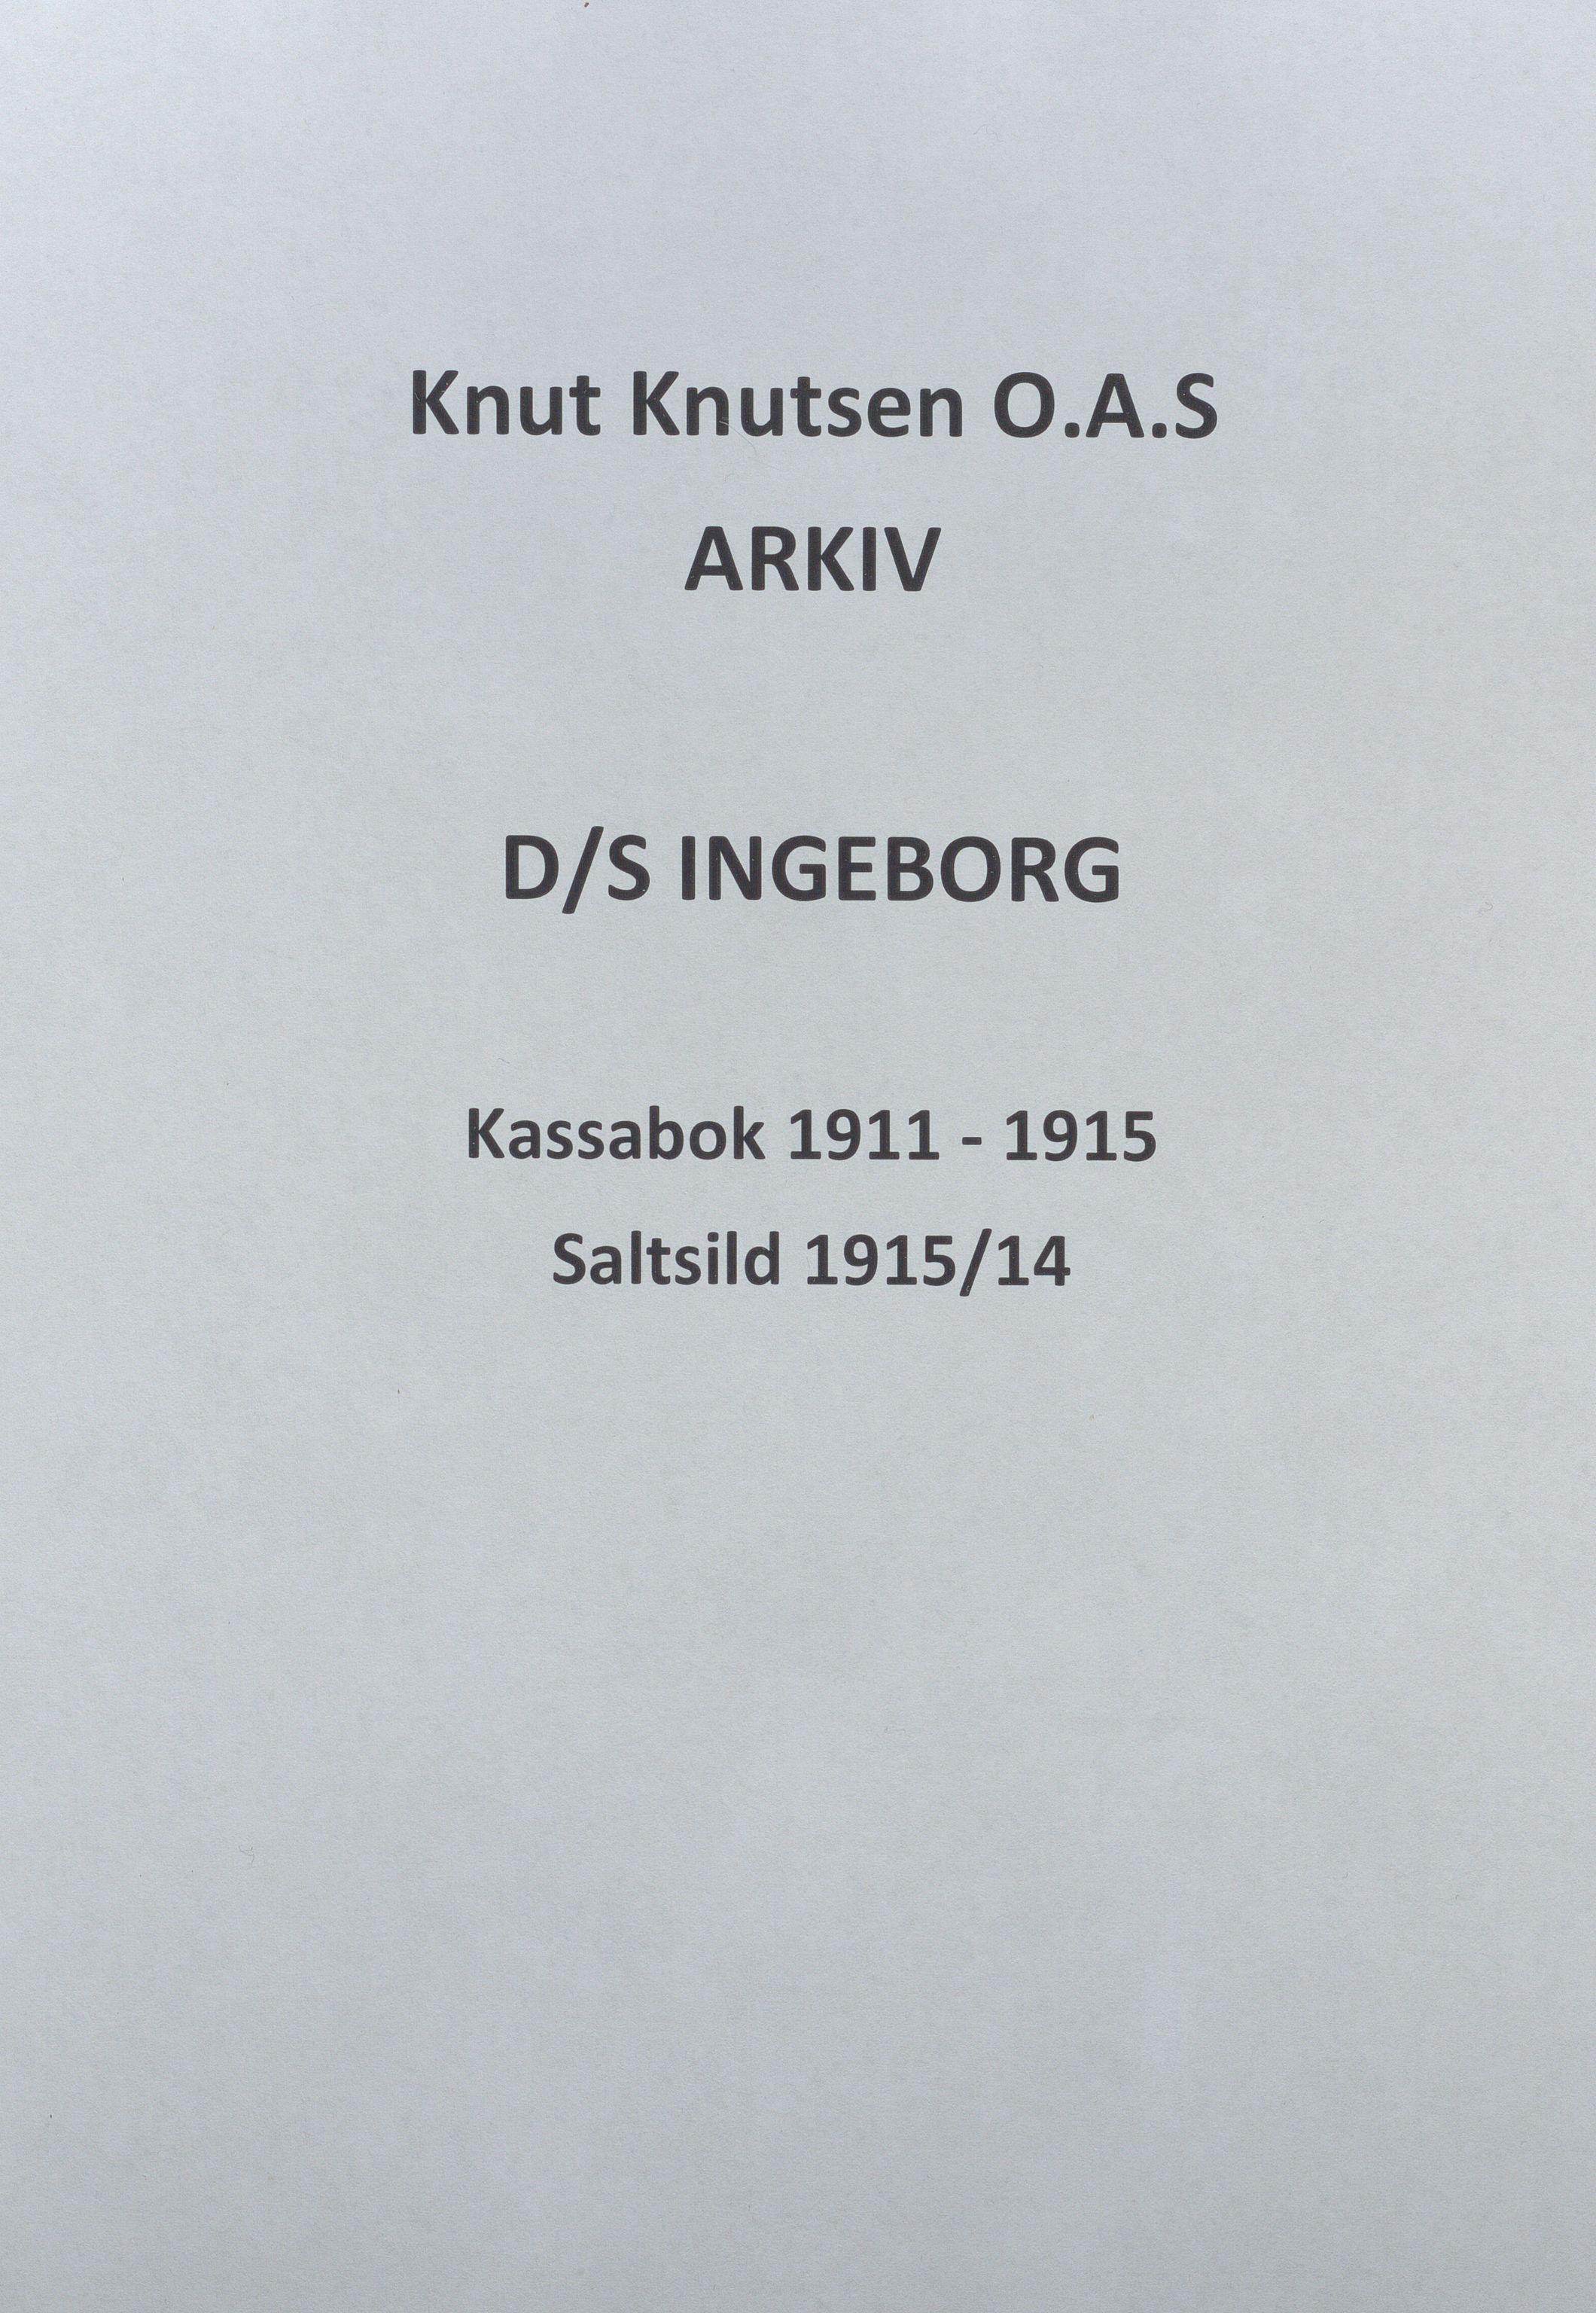 HABI, Knut Knutsen O.A.S., 1911-1915